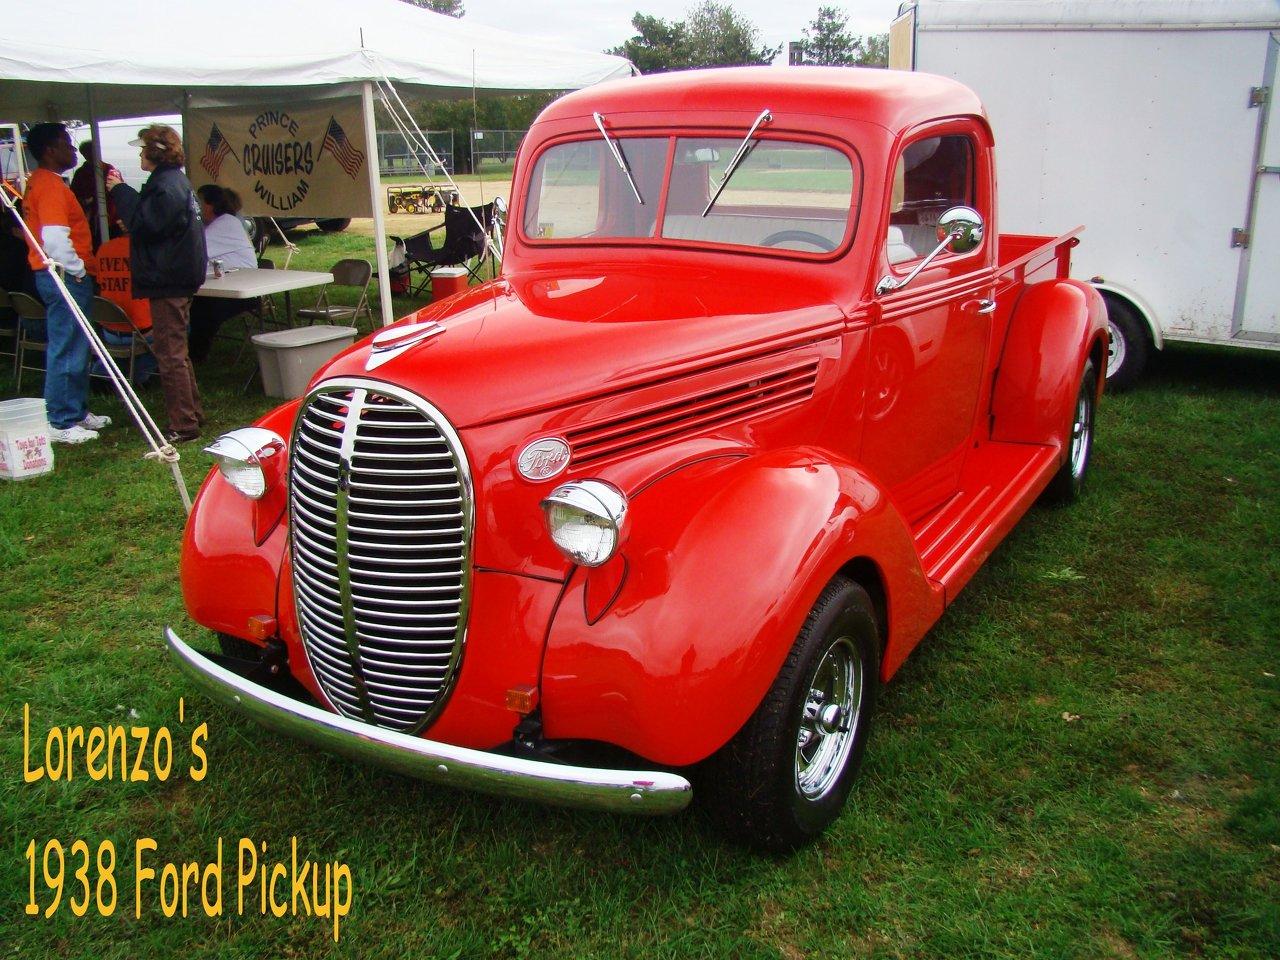 Lorenzos 1938 Ford PU.jpg